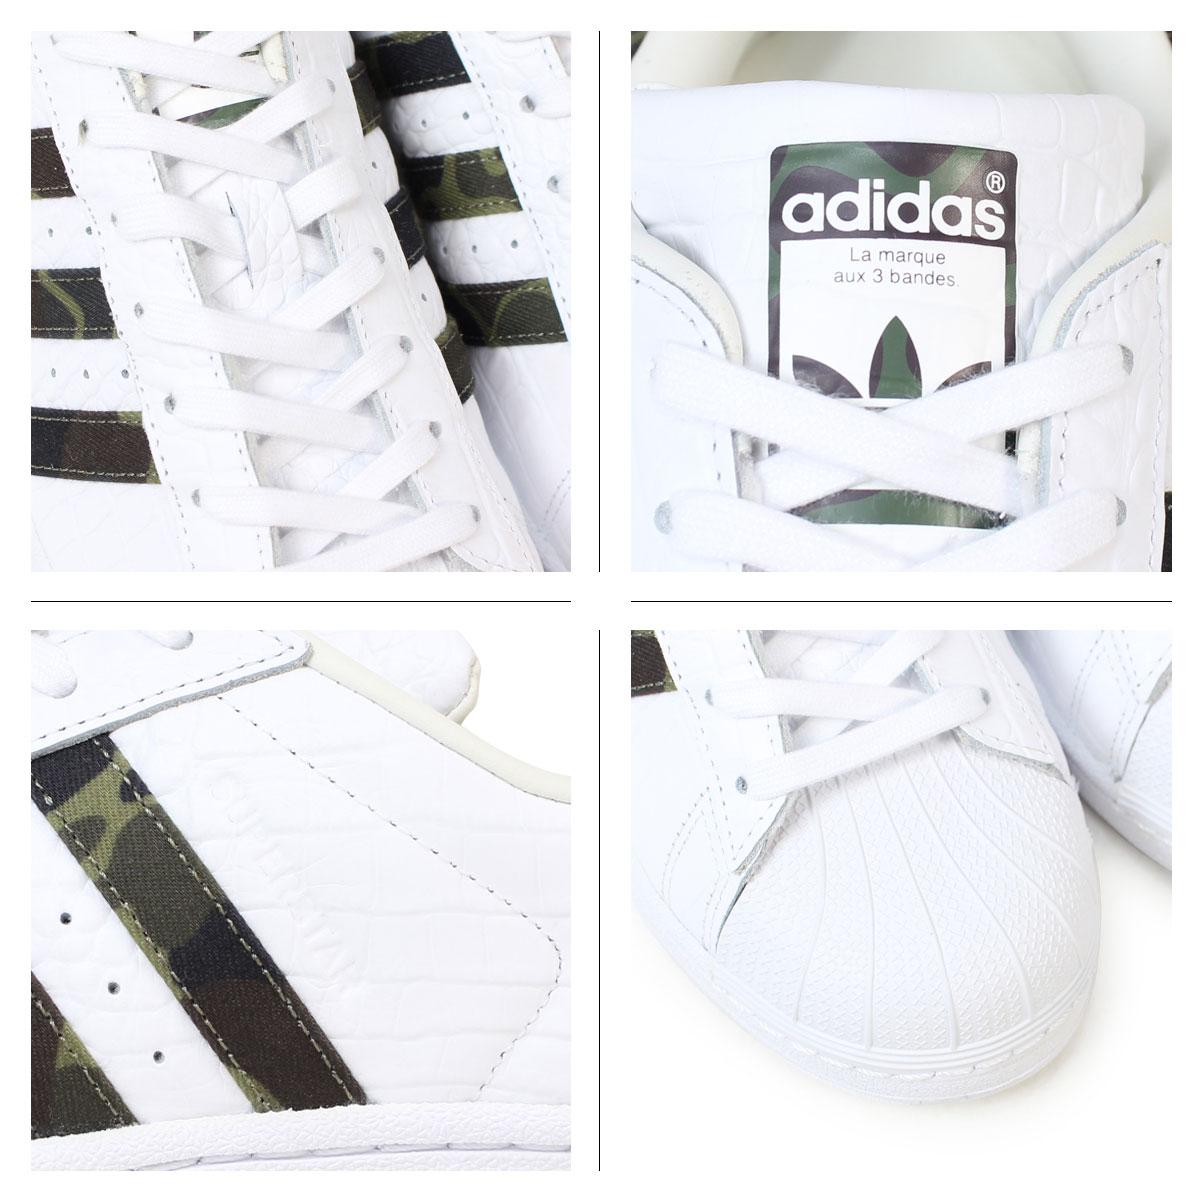 2000 Adidas Superstar kMZzkc2y